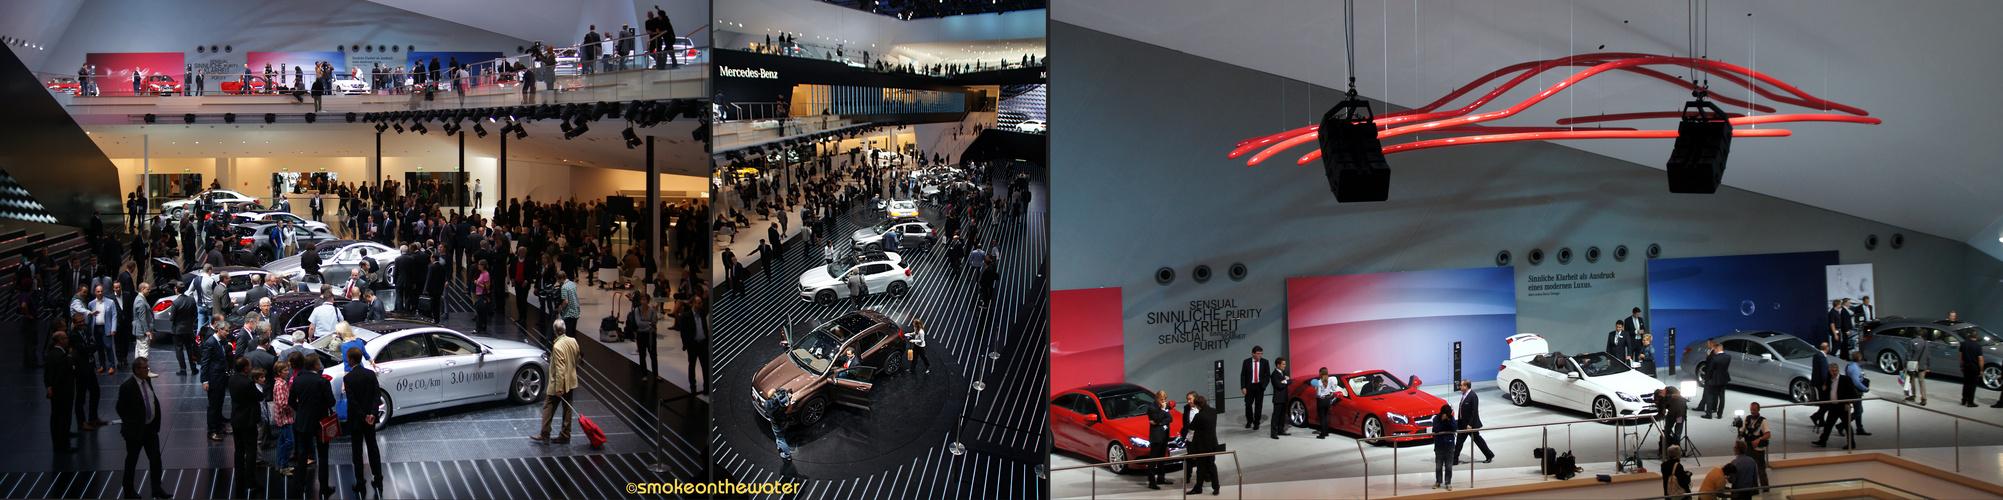 Mercedes-Benz @ Festhalle